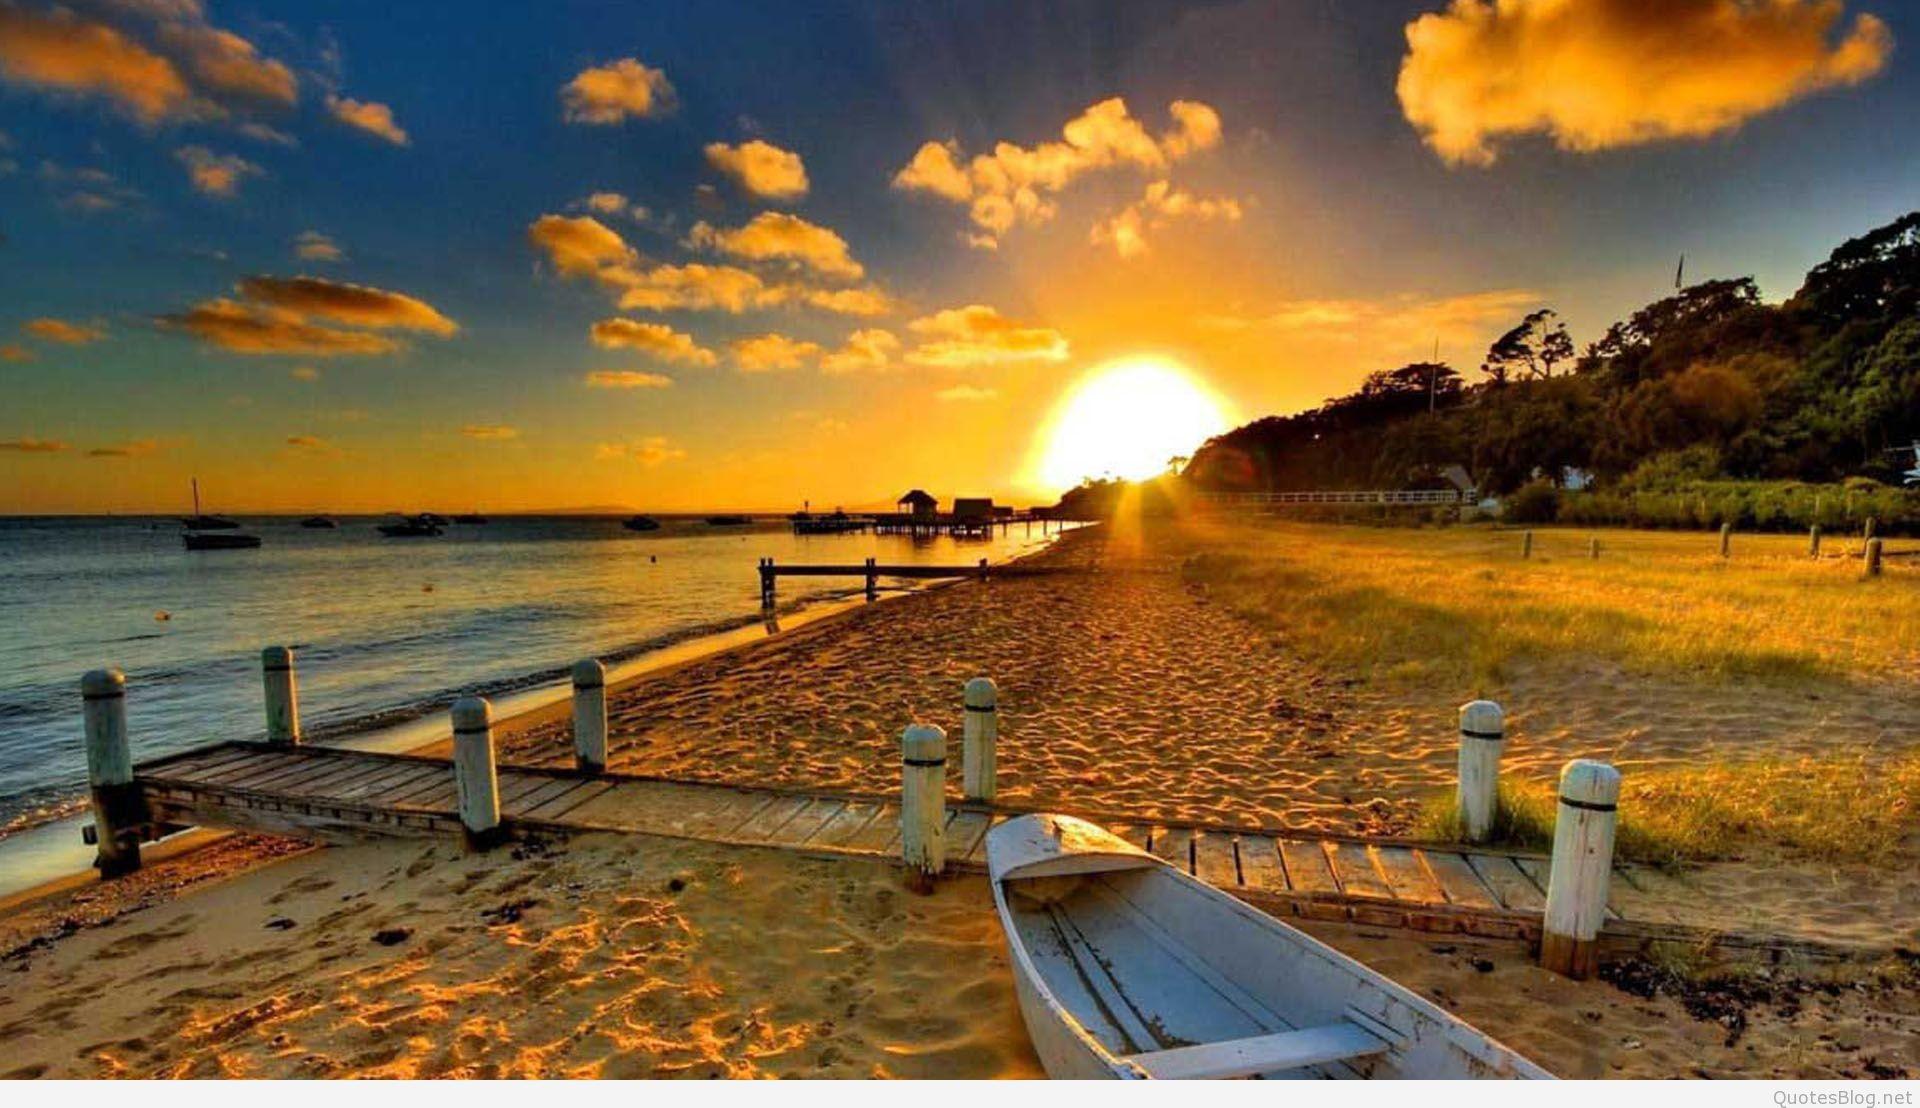 free summer desktop wallpaper,sky,nature,natural landscape,sunset,shore